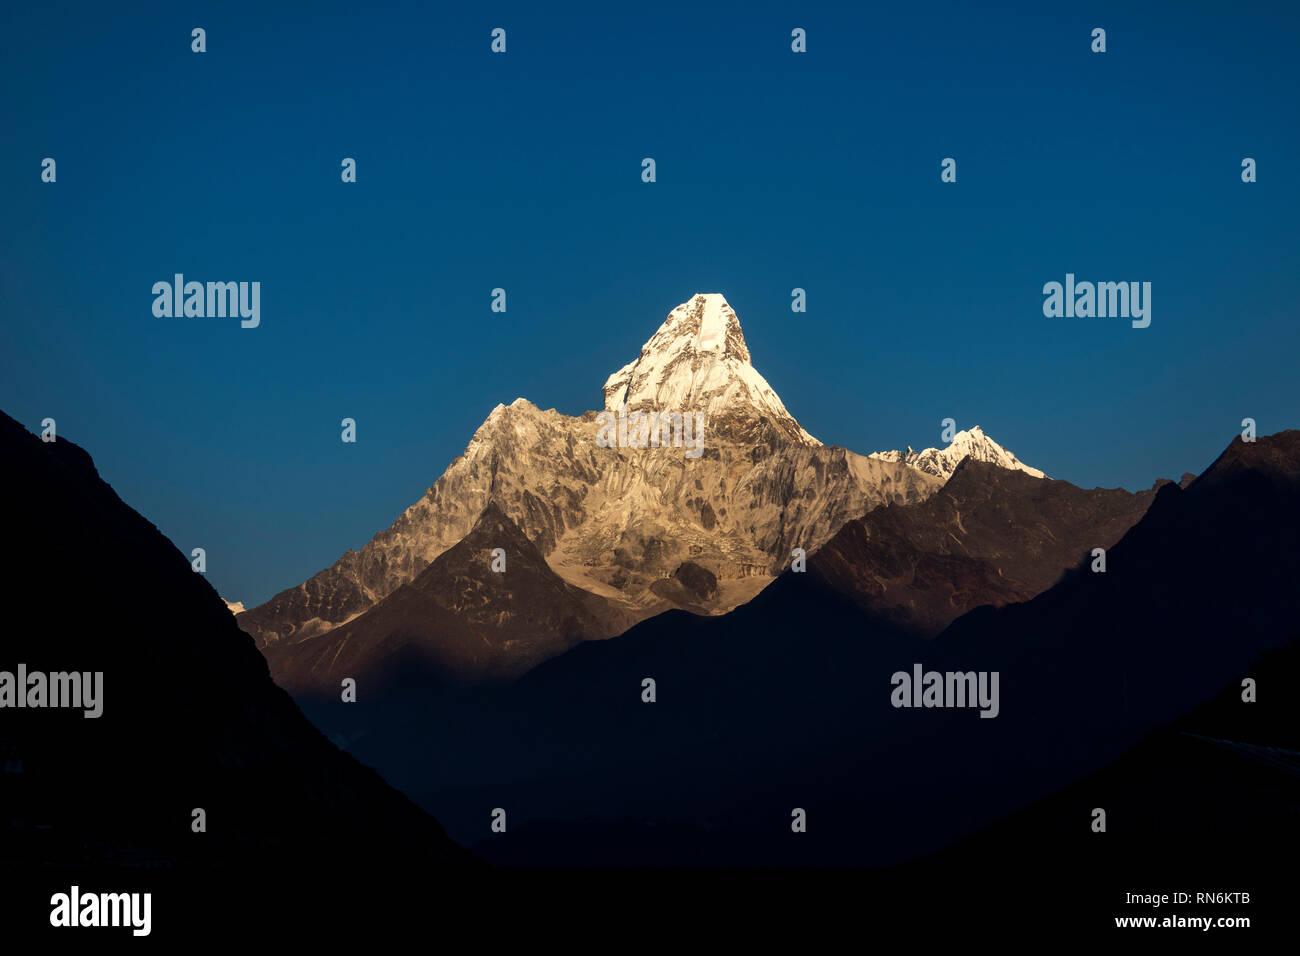 Nepal, Everest Base Camp Trek, Khumjung, Mount Ama Dablam, early morning view - Stock Image